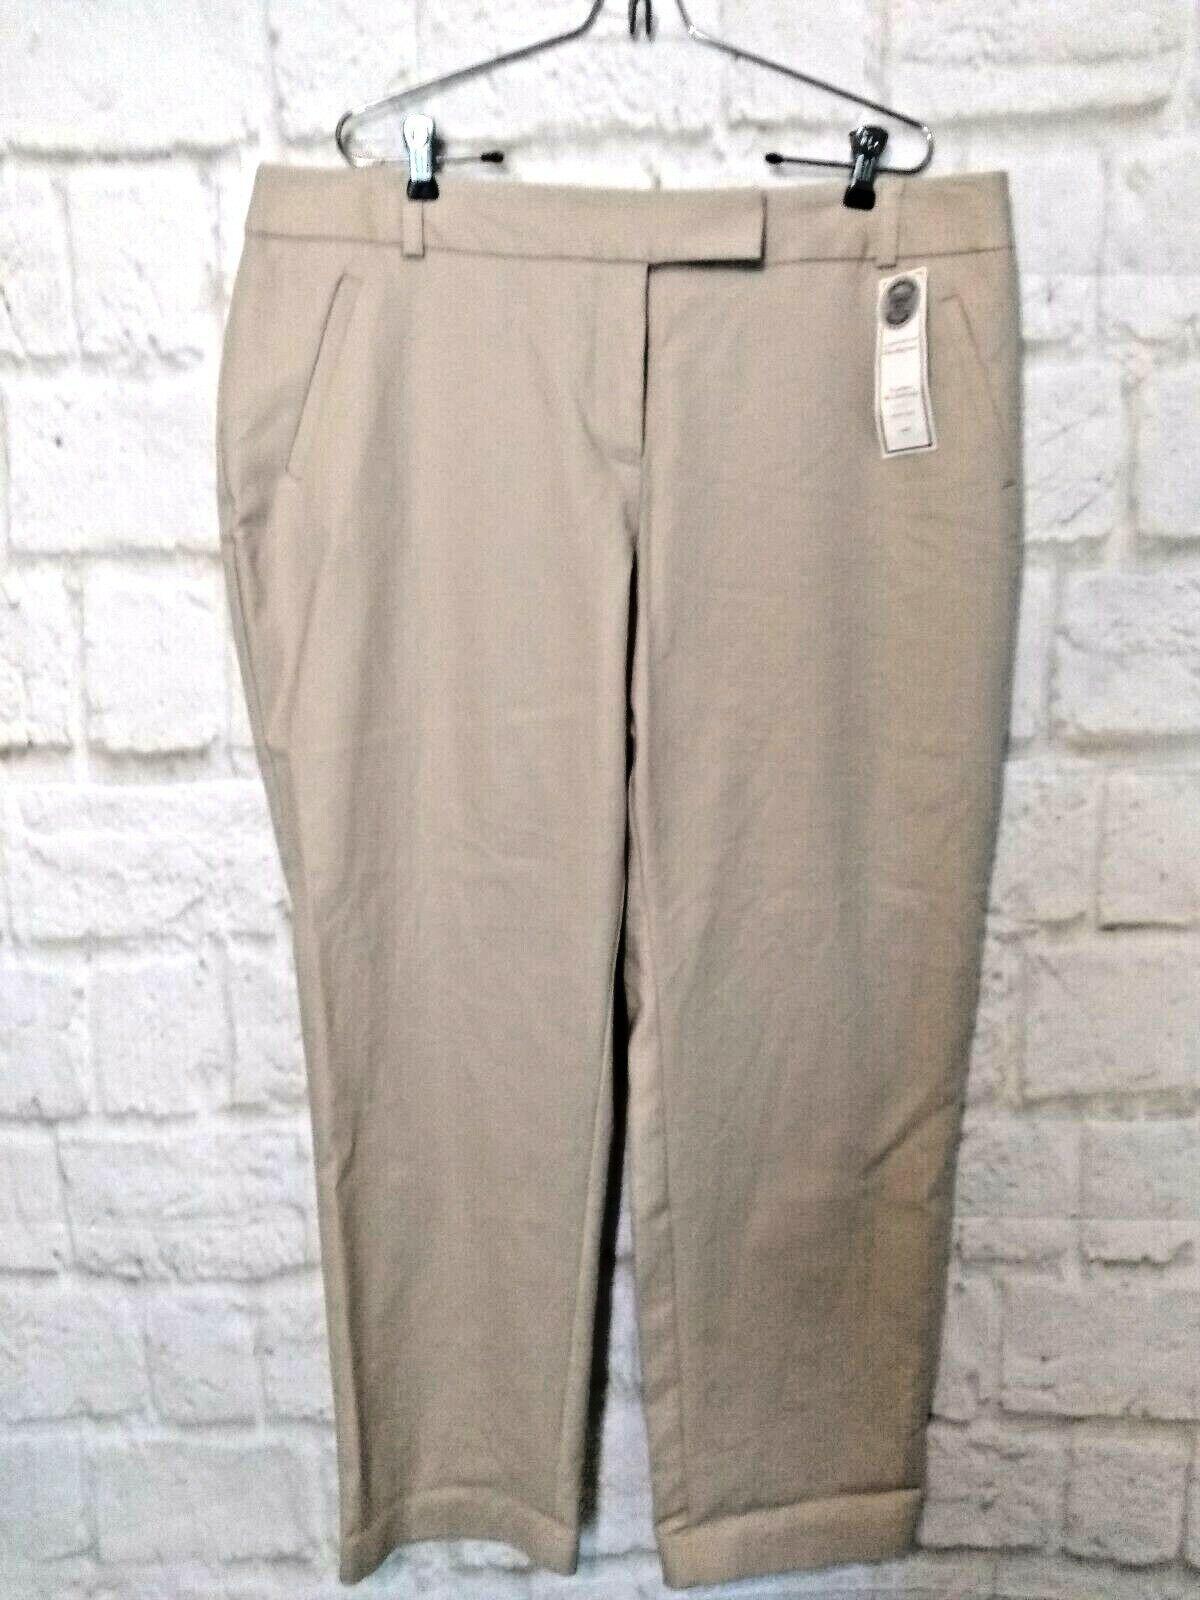 New Charter Club damen pant khaki casual pocket slim leg tummy control Größe 18W